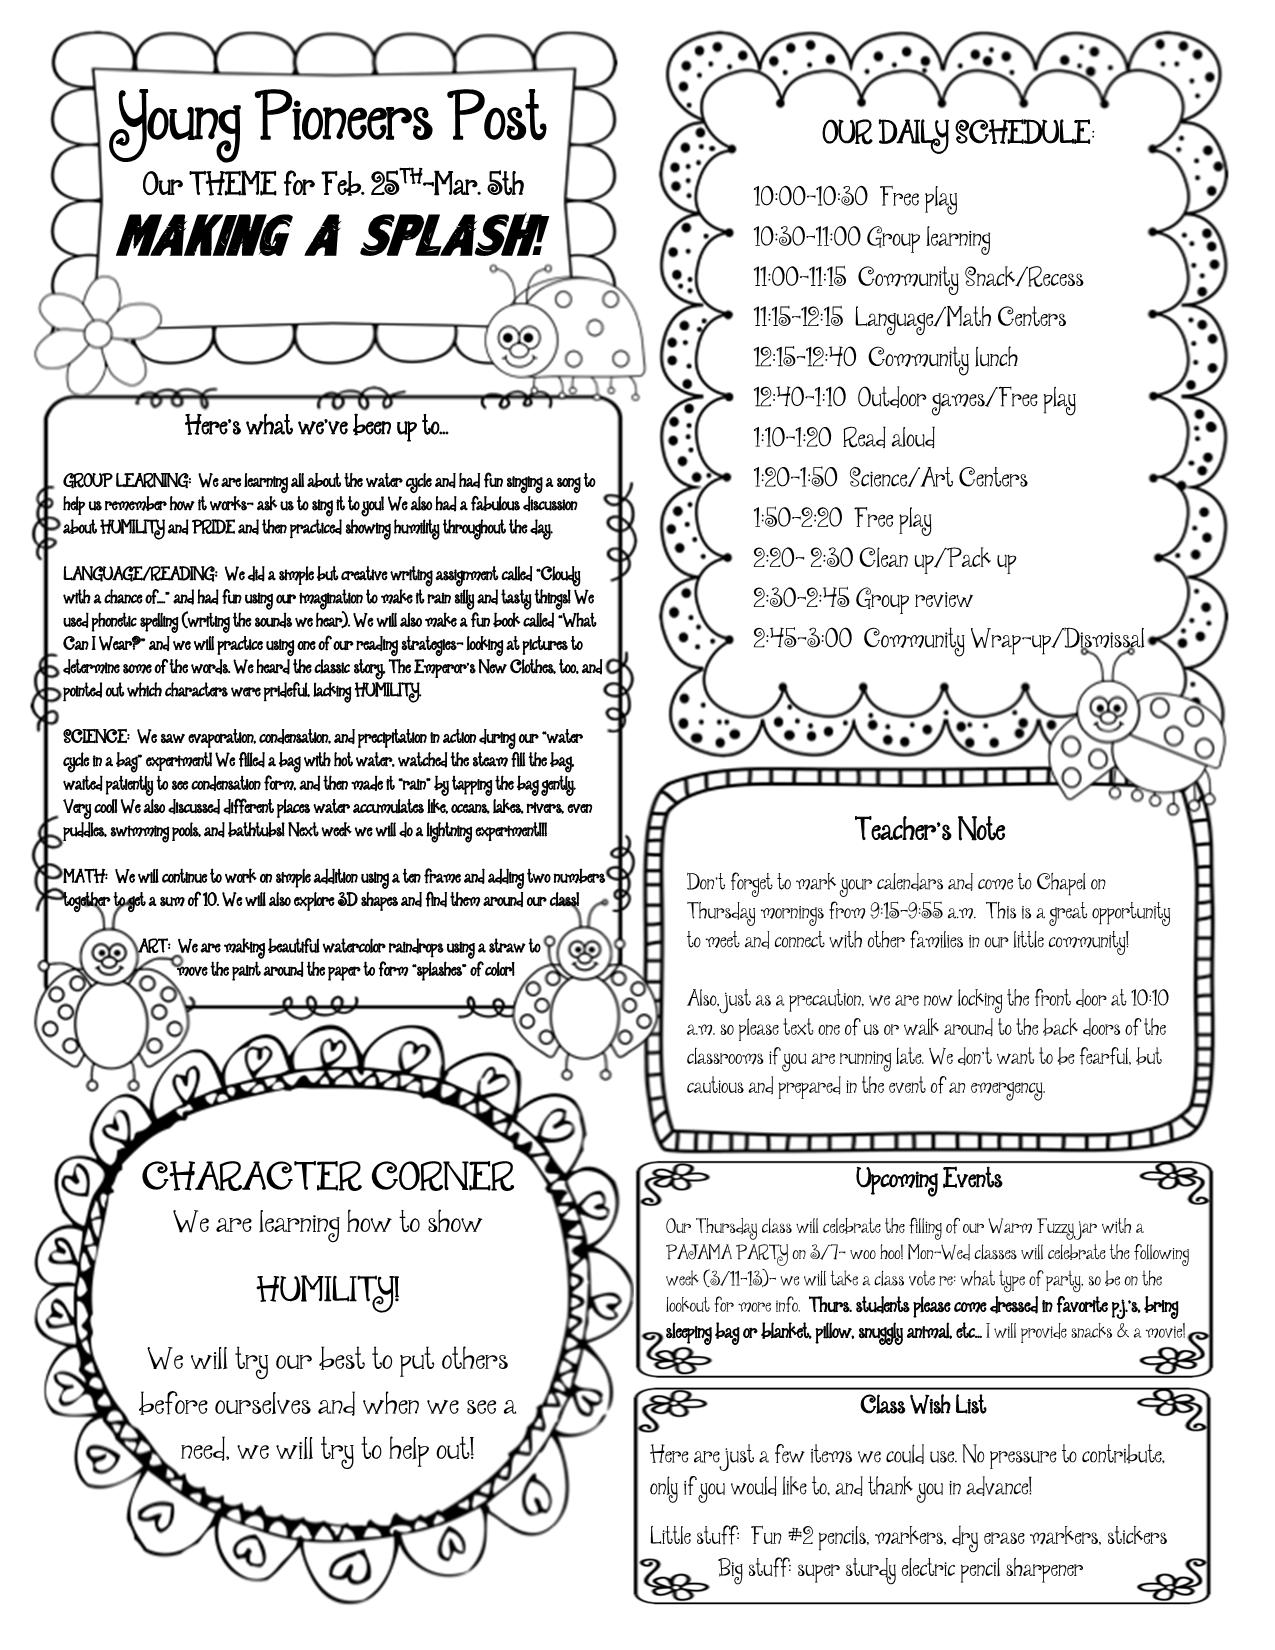 Newsletter Making a Splash 7 and 8.jpg